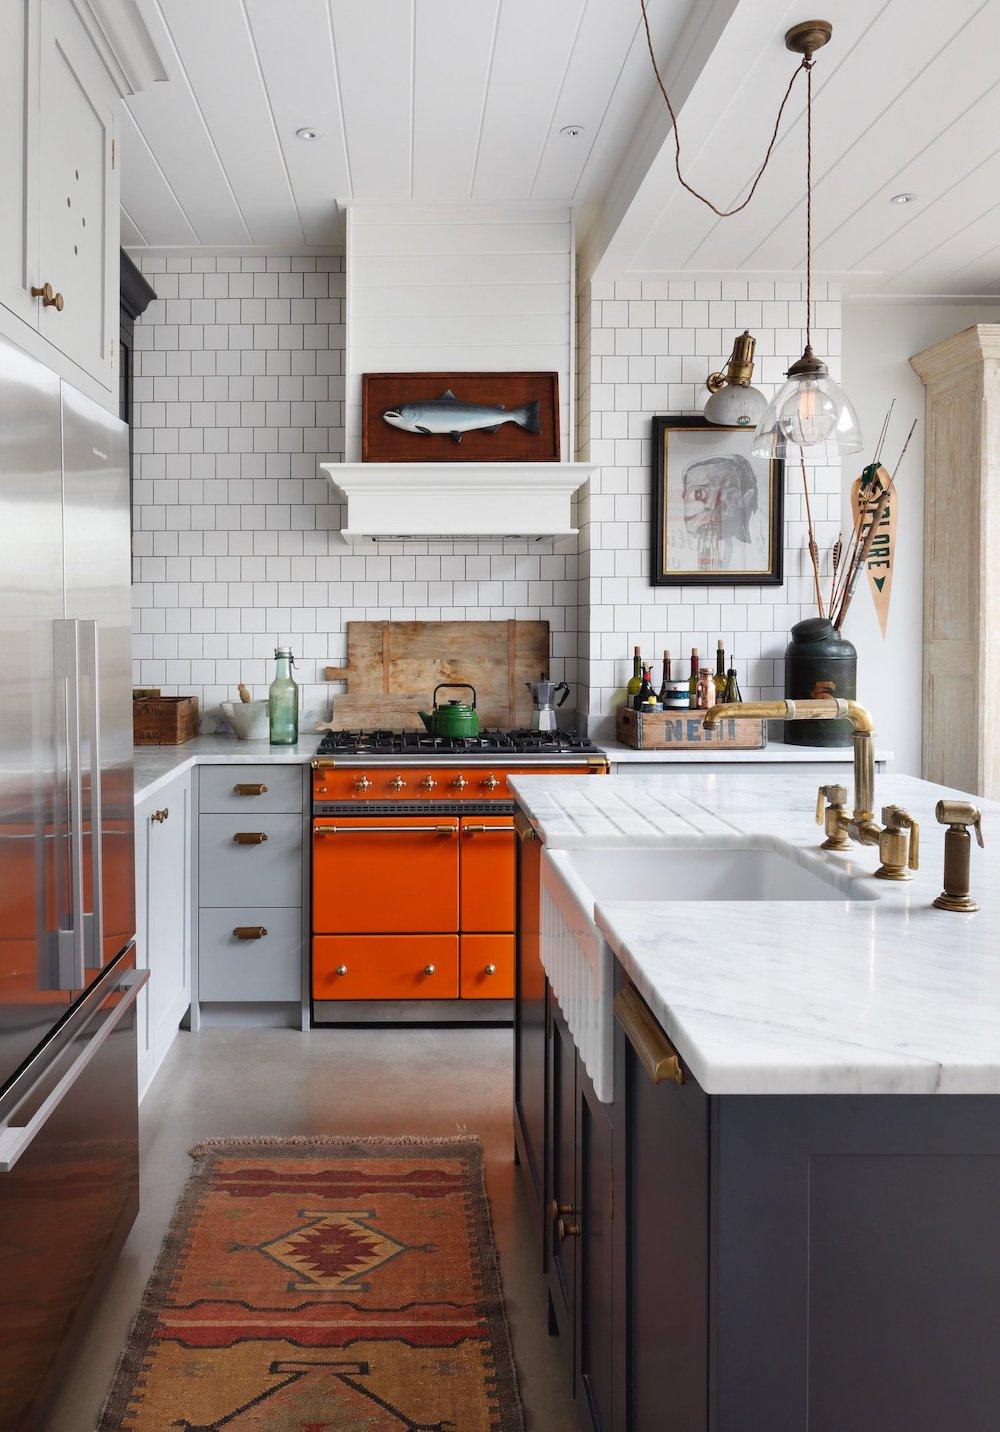 Grey kitchen with orange range cooker || Colour in the kitchen - FIRST SENSE